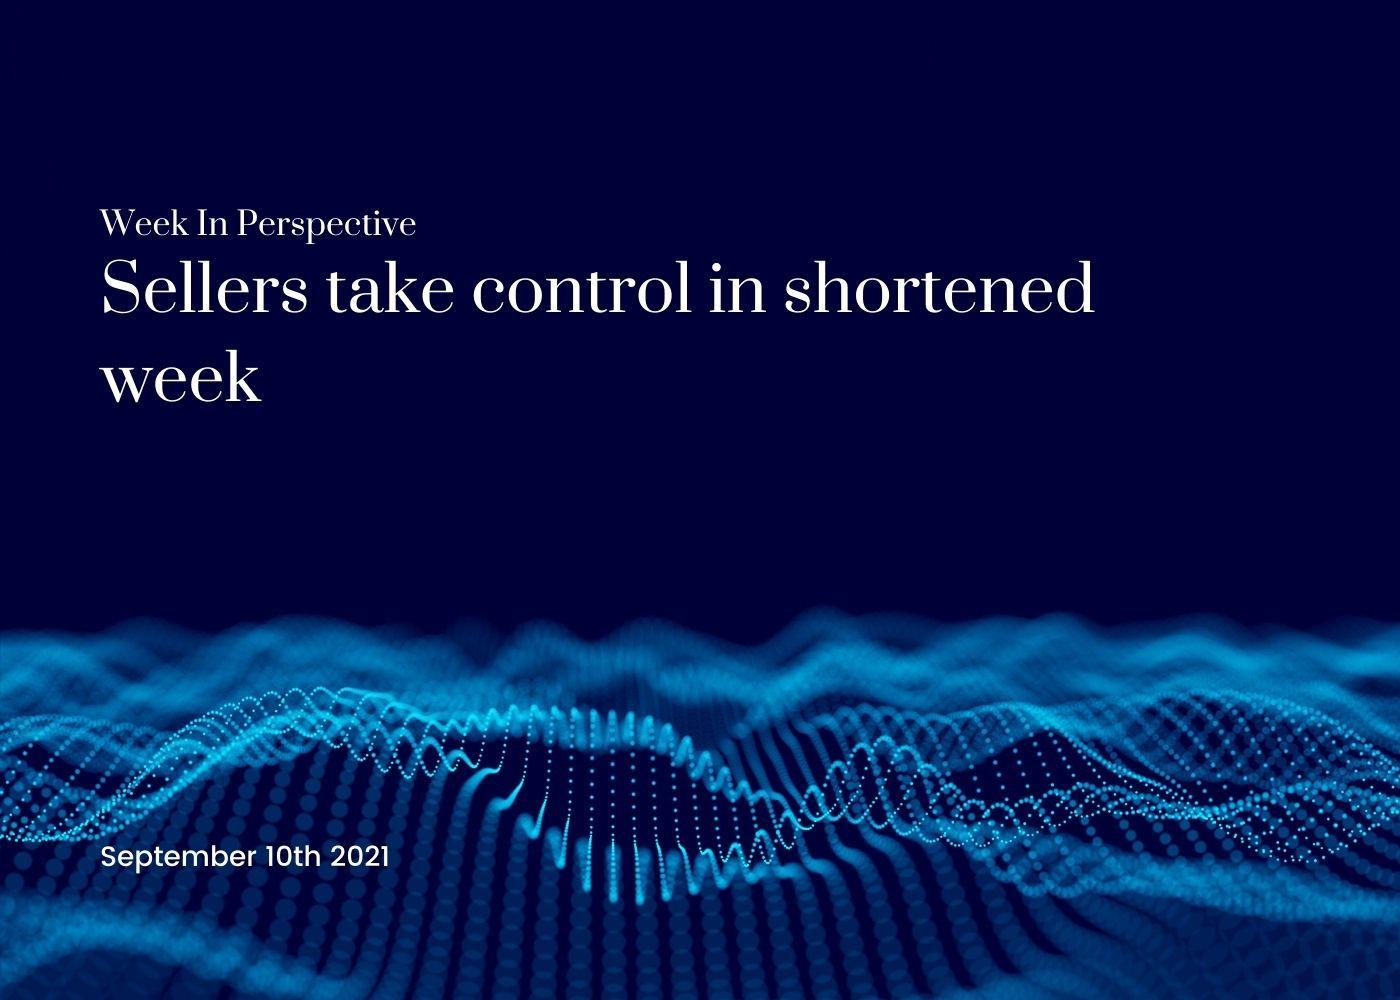 Week In Perspective September 10, 2021: Seller take control in shortened week. Thumbnail